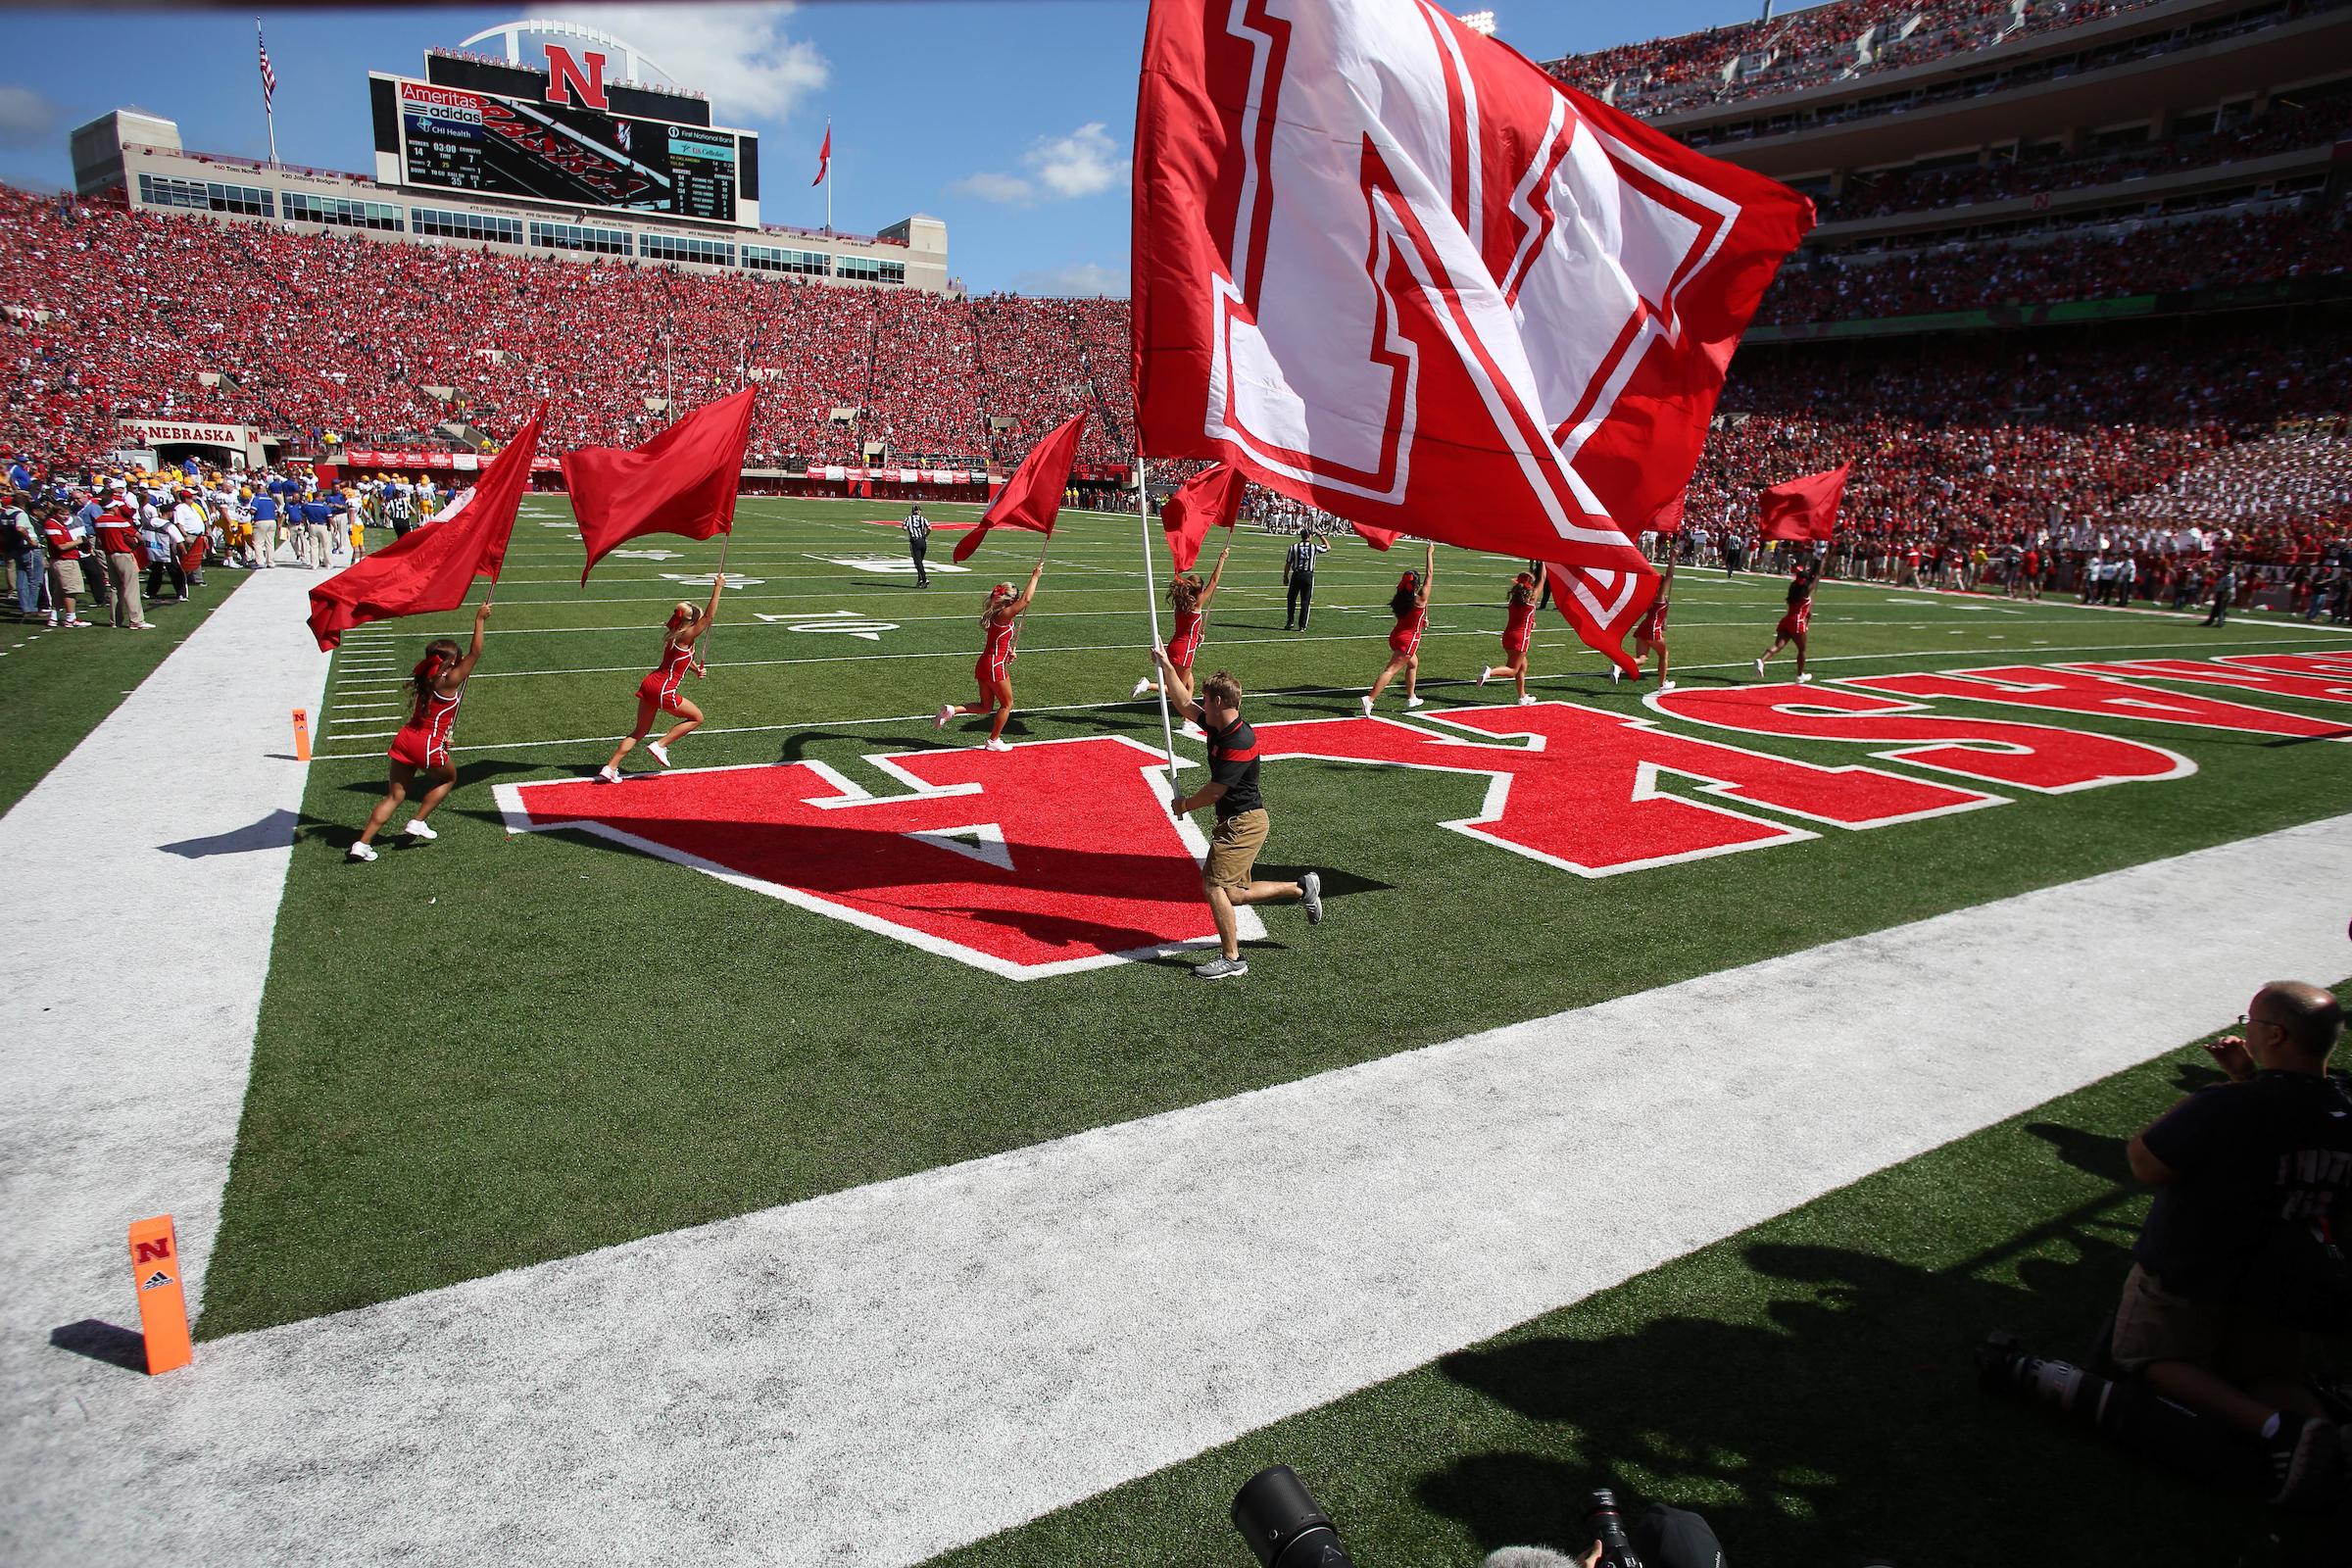 Image courtesy University of Nebraska Athletics